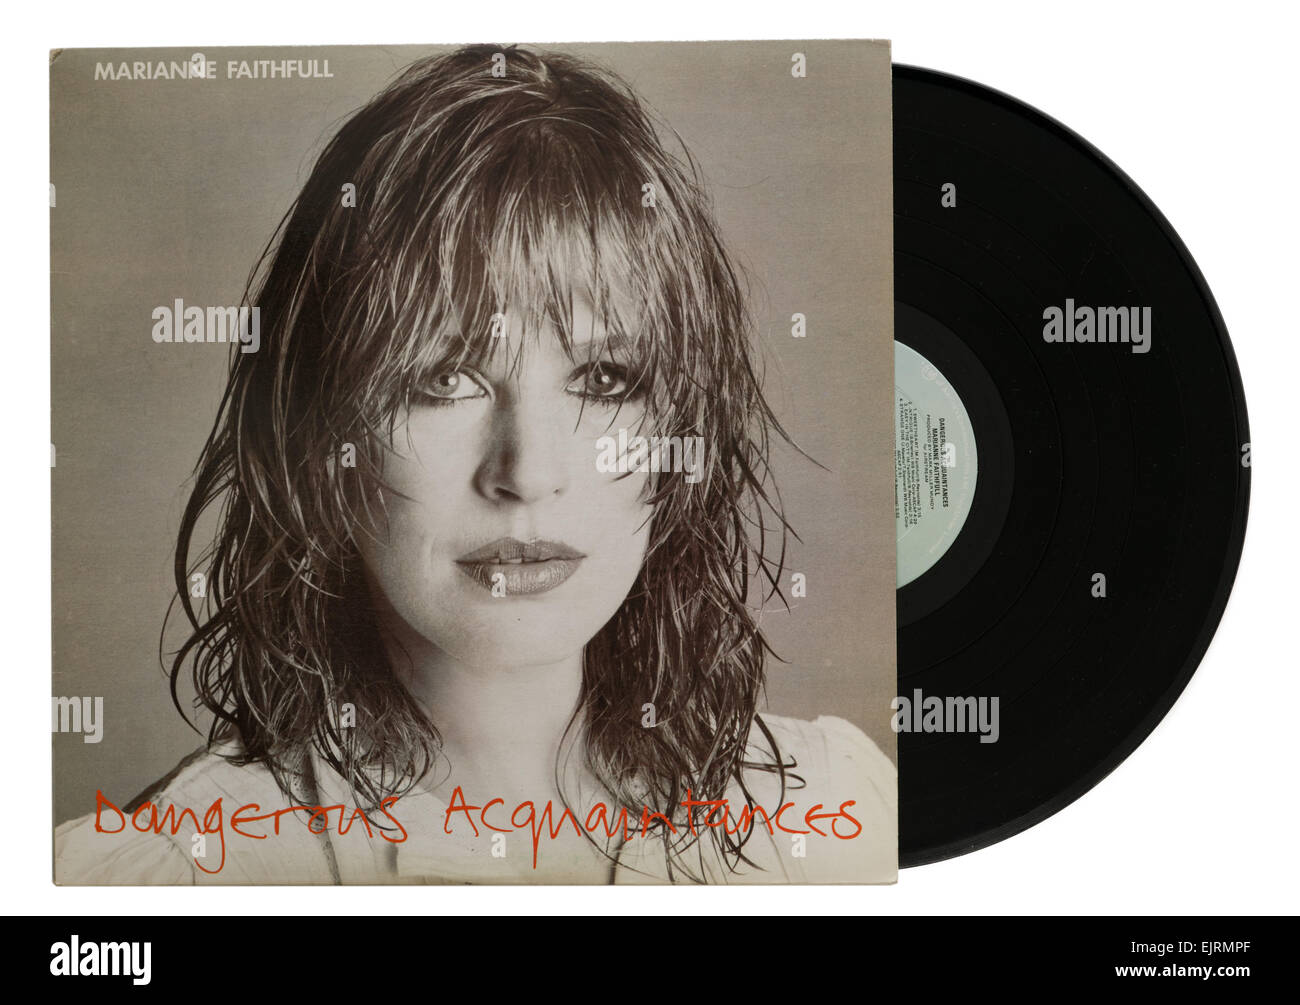 Marianne Faithfull album Dangerous Acquaintances - Stock Image